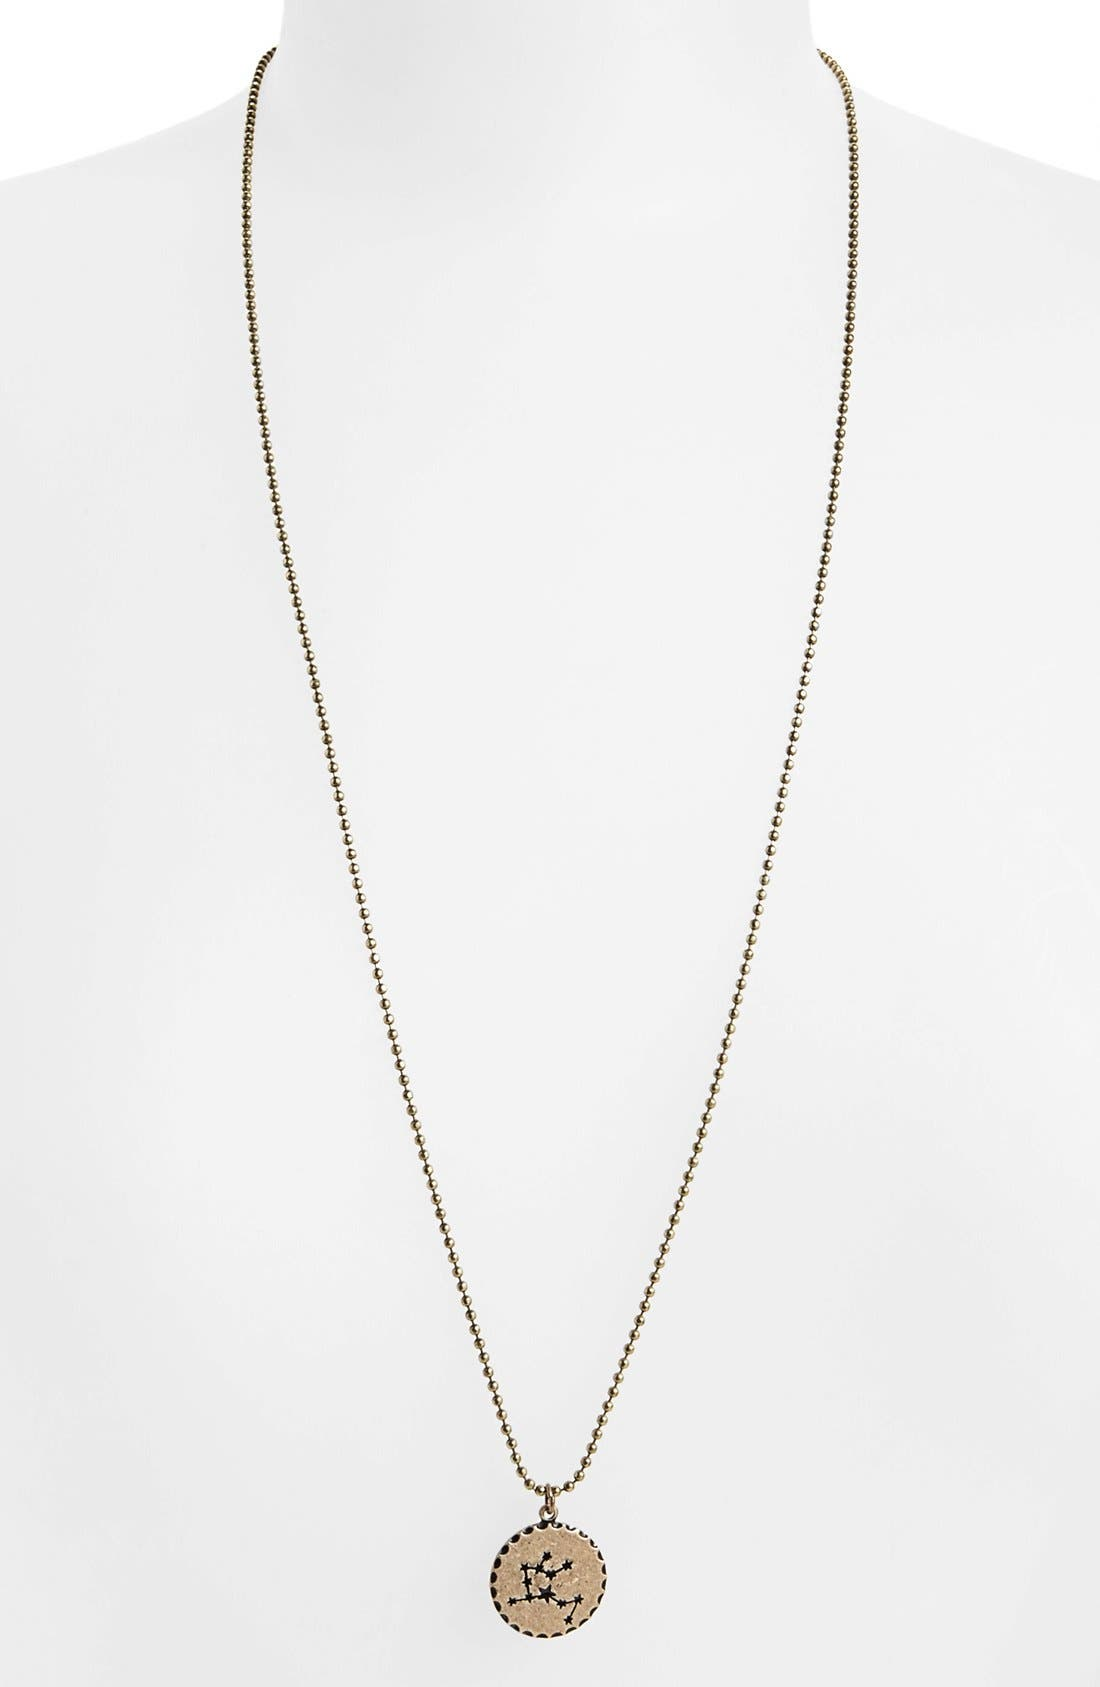 Alternate Image 1 Selected - Bonnie Jonas 'Zodiac Constellation' Pendant Necklace